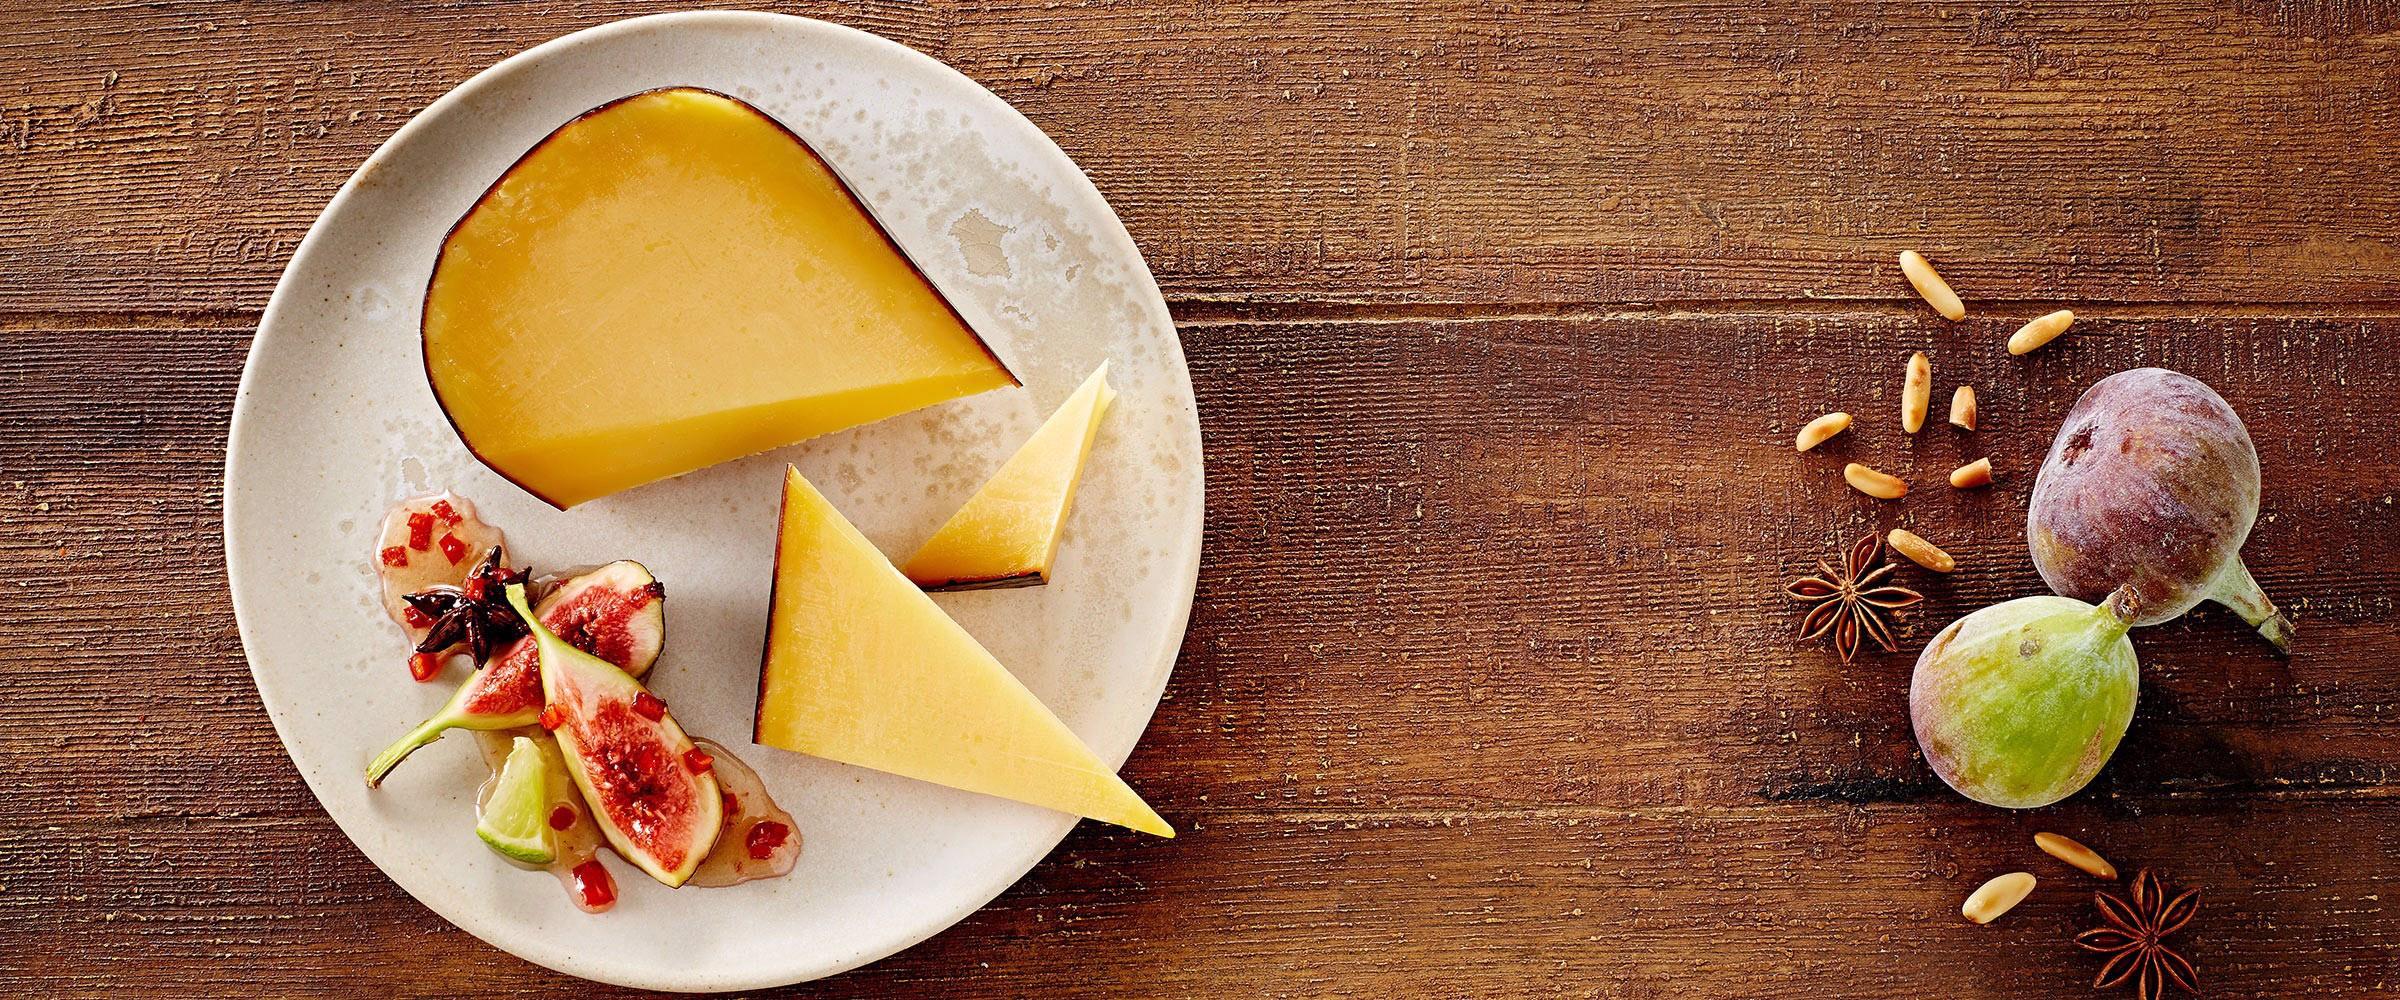 Hvad er gouda ost?